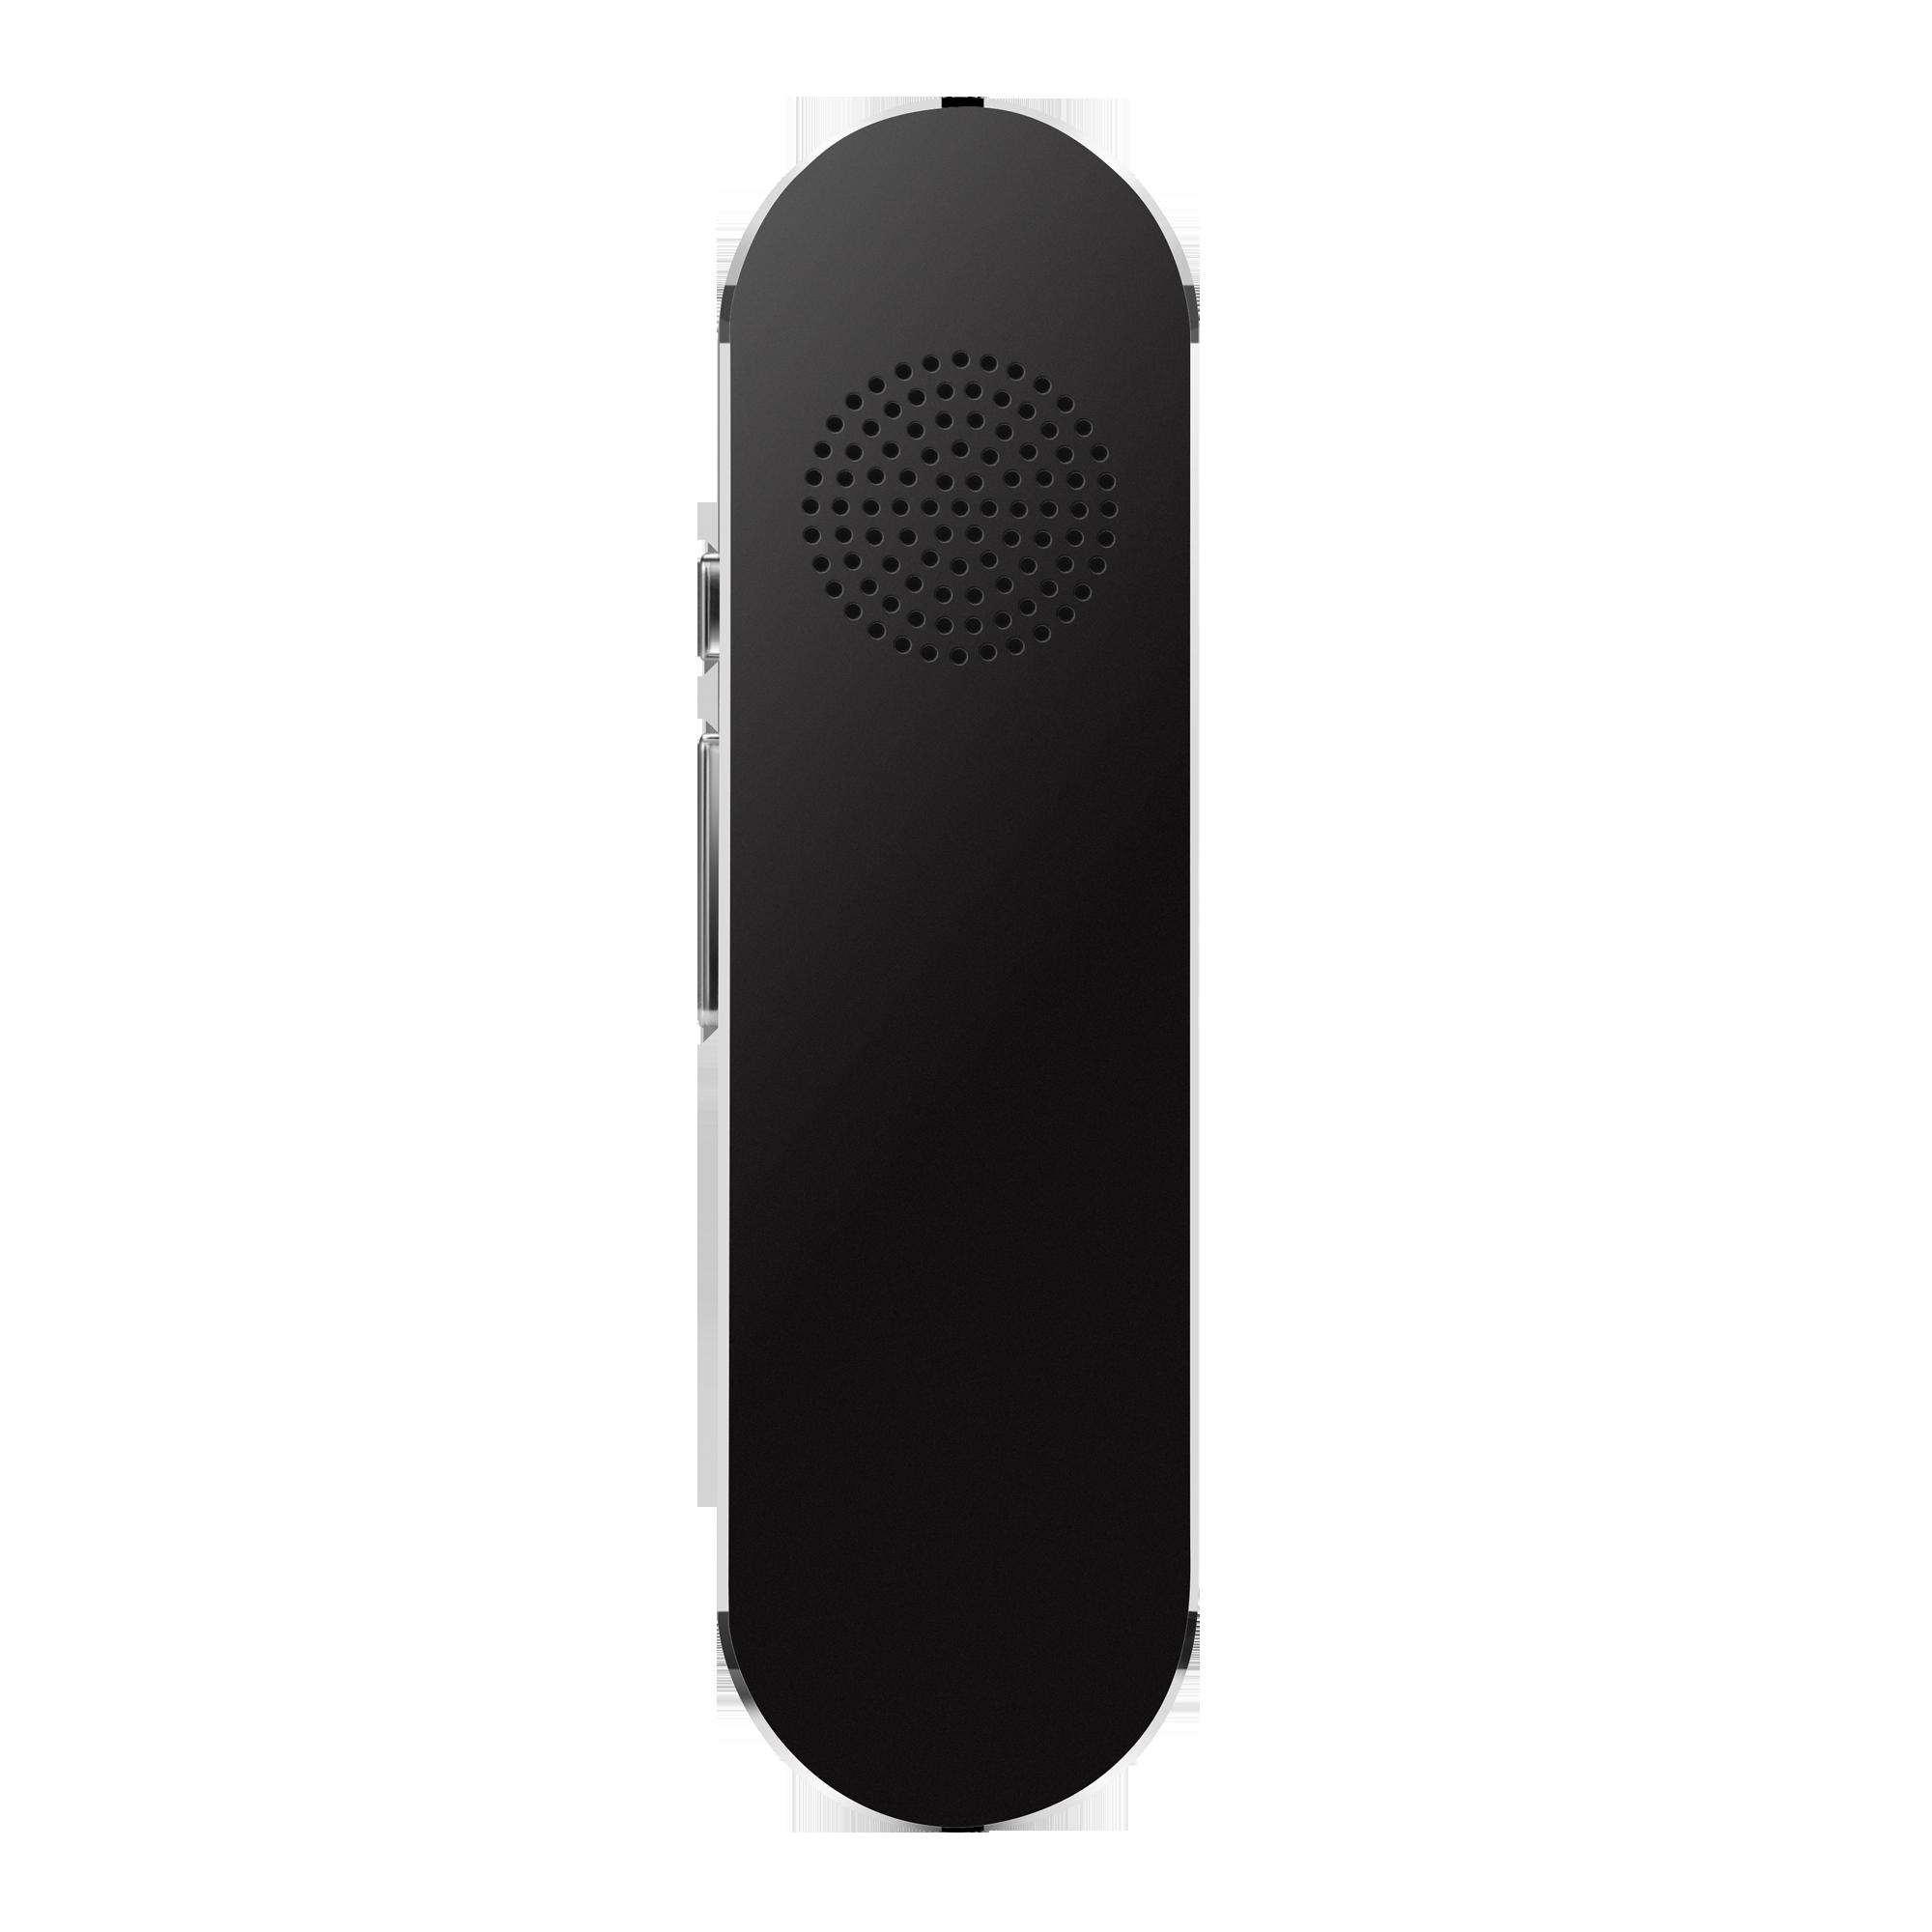 K8 Smart Real Time Voice 68 Kinds of Languages Portable Translator Travel Use black